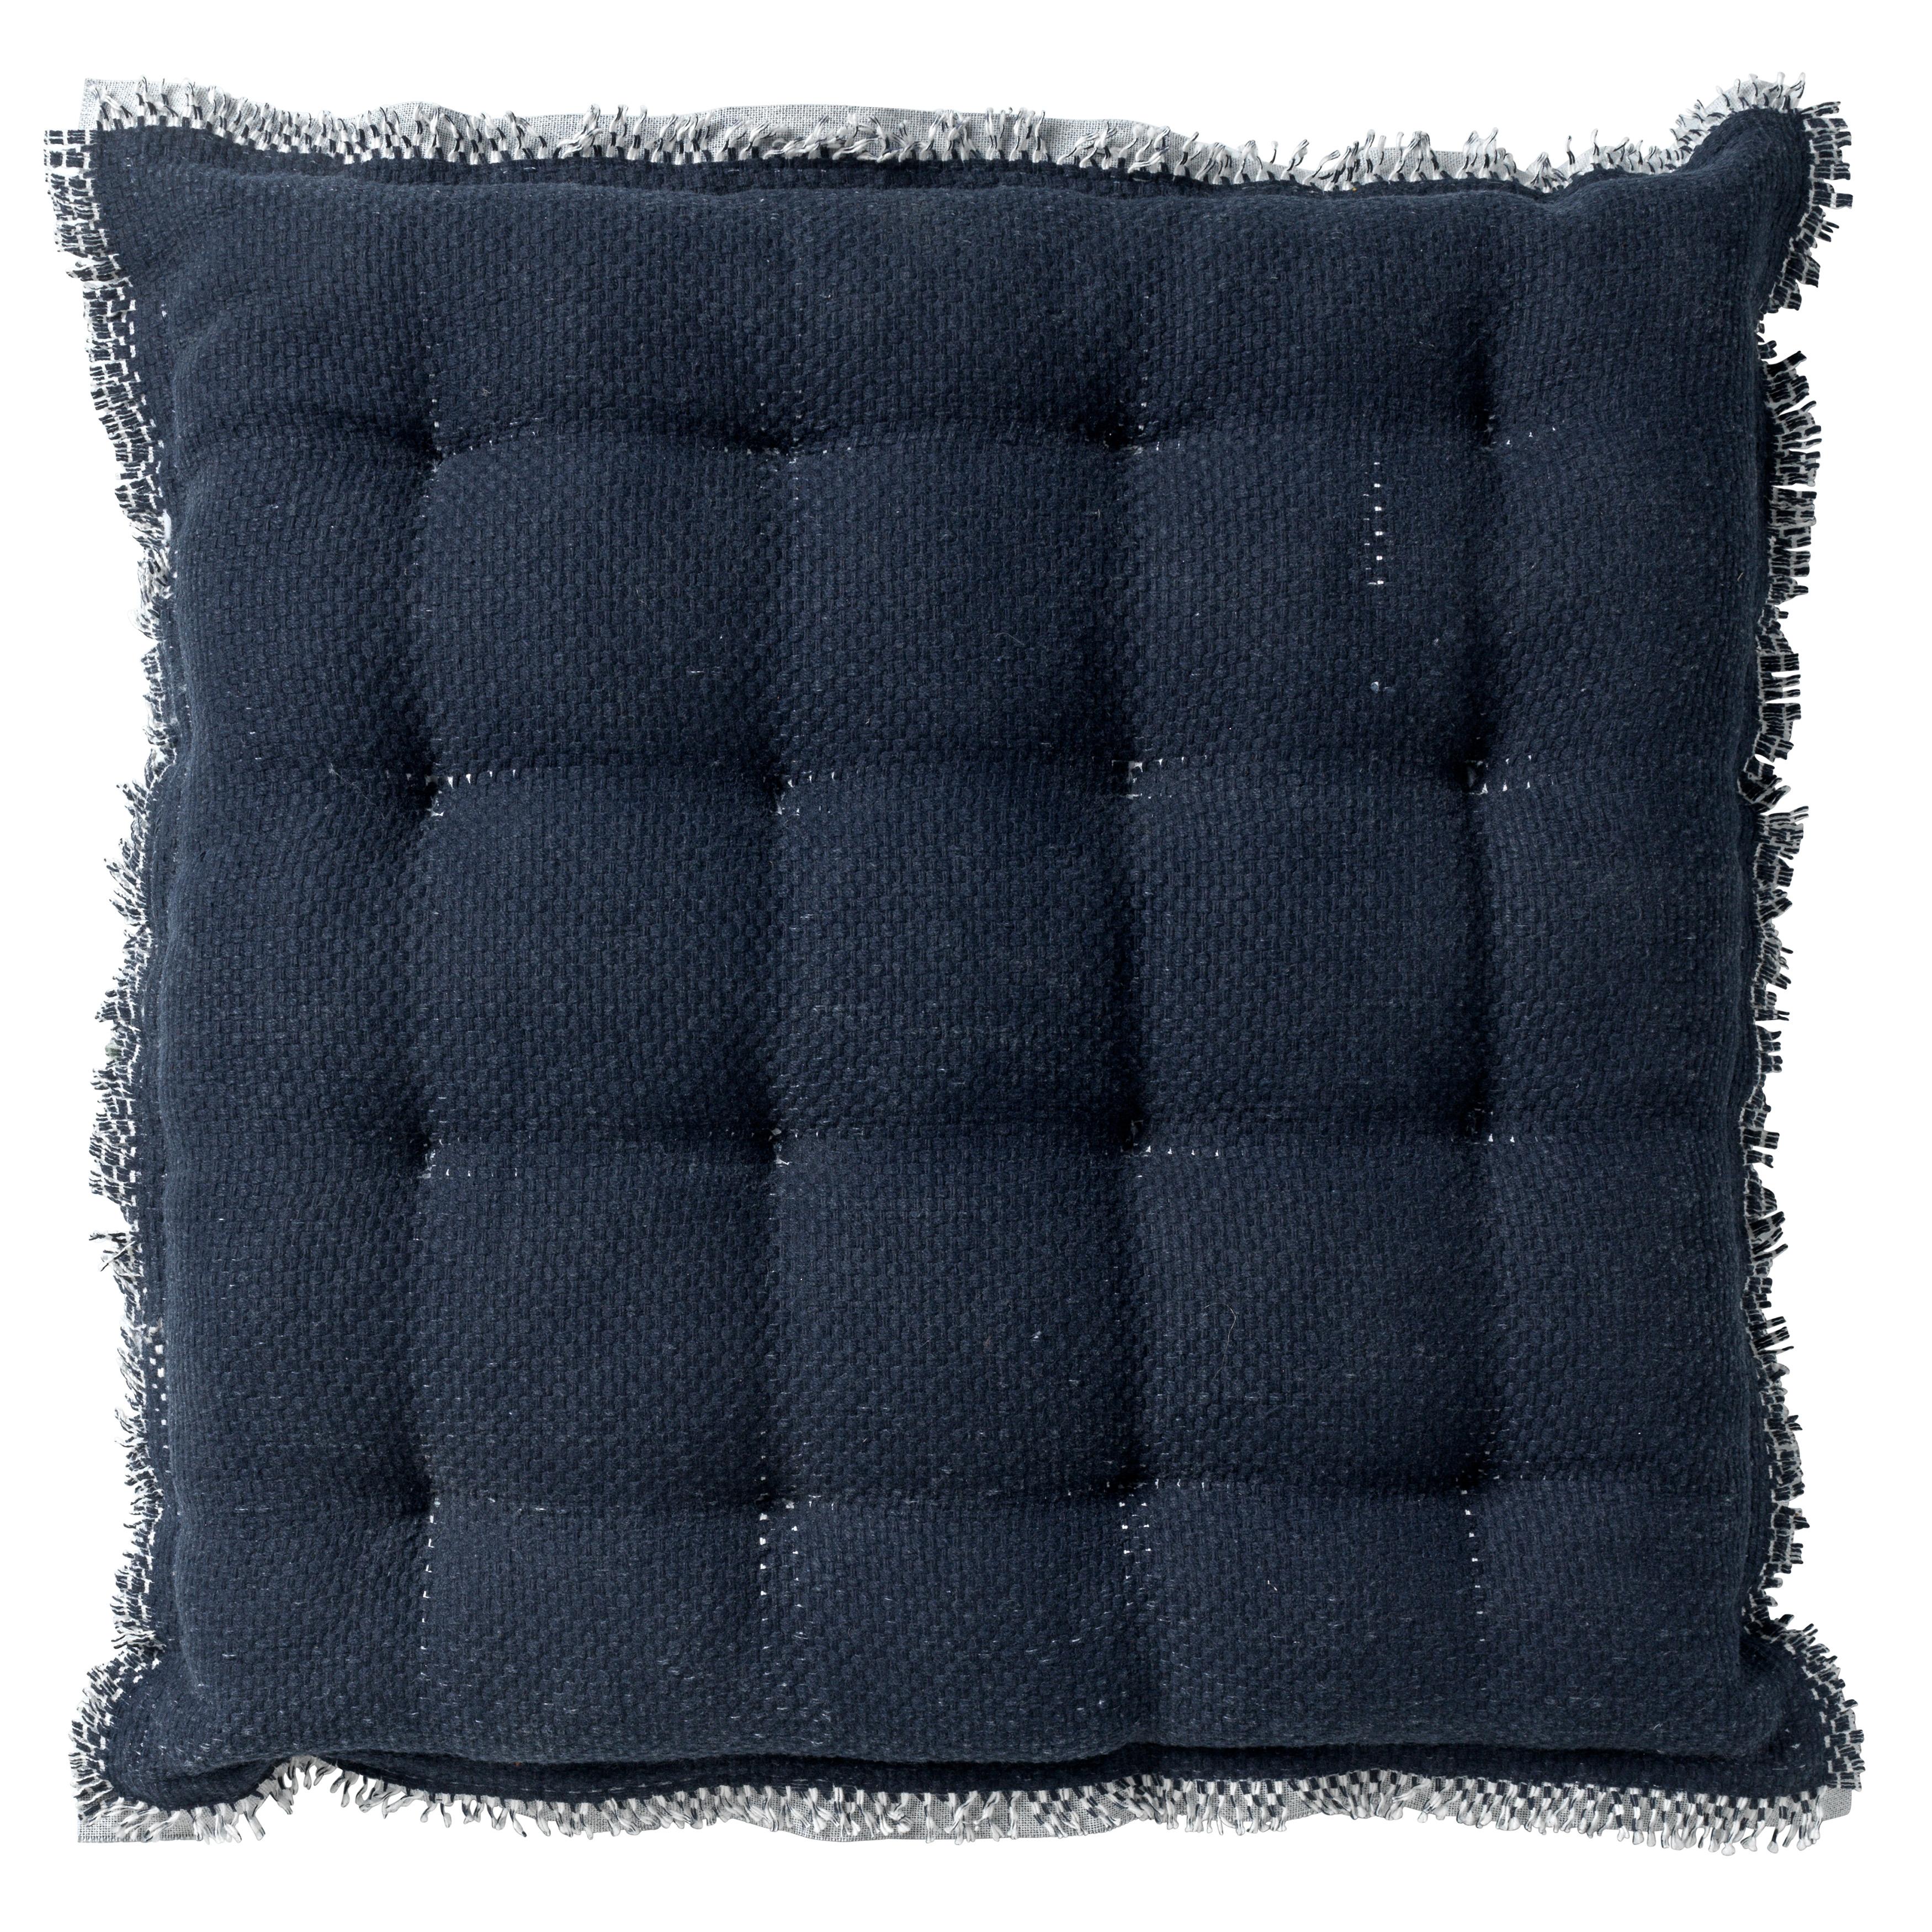 Coussin de sol en coton Bleu saphir 40x40